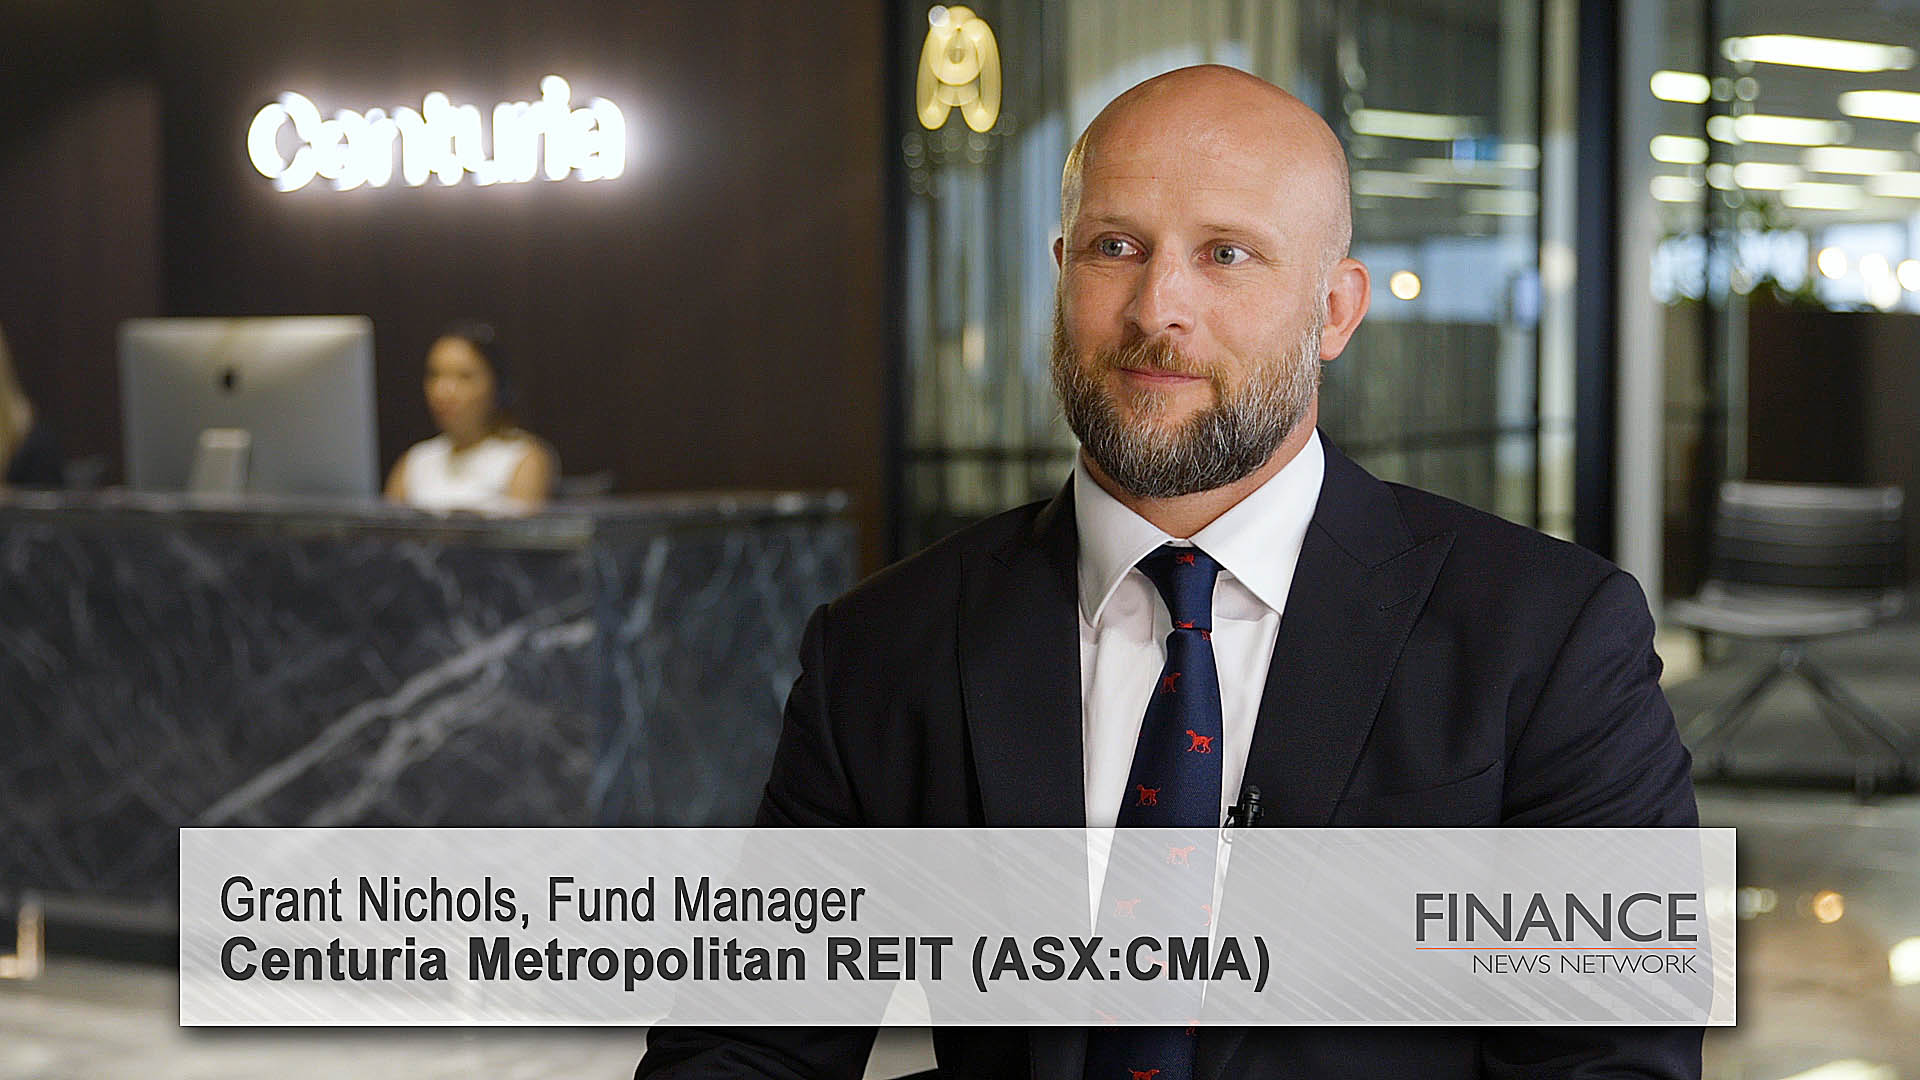 Centuria Metropolitan REIT (ASX:CMA) 1H20 results & outlook